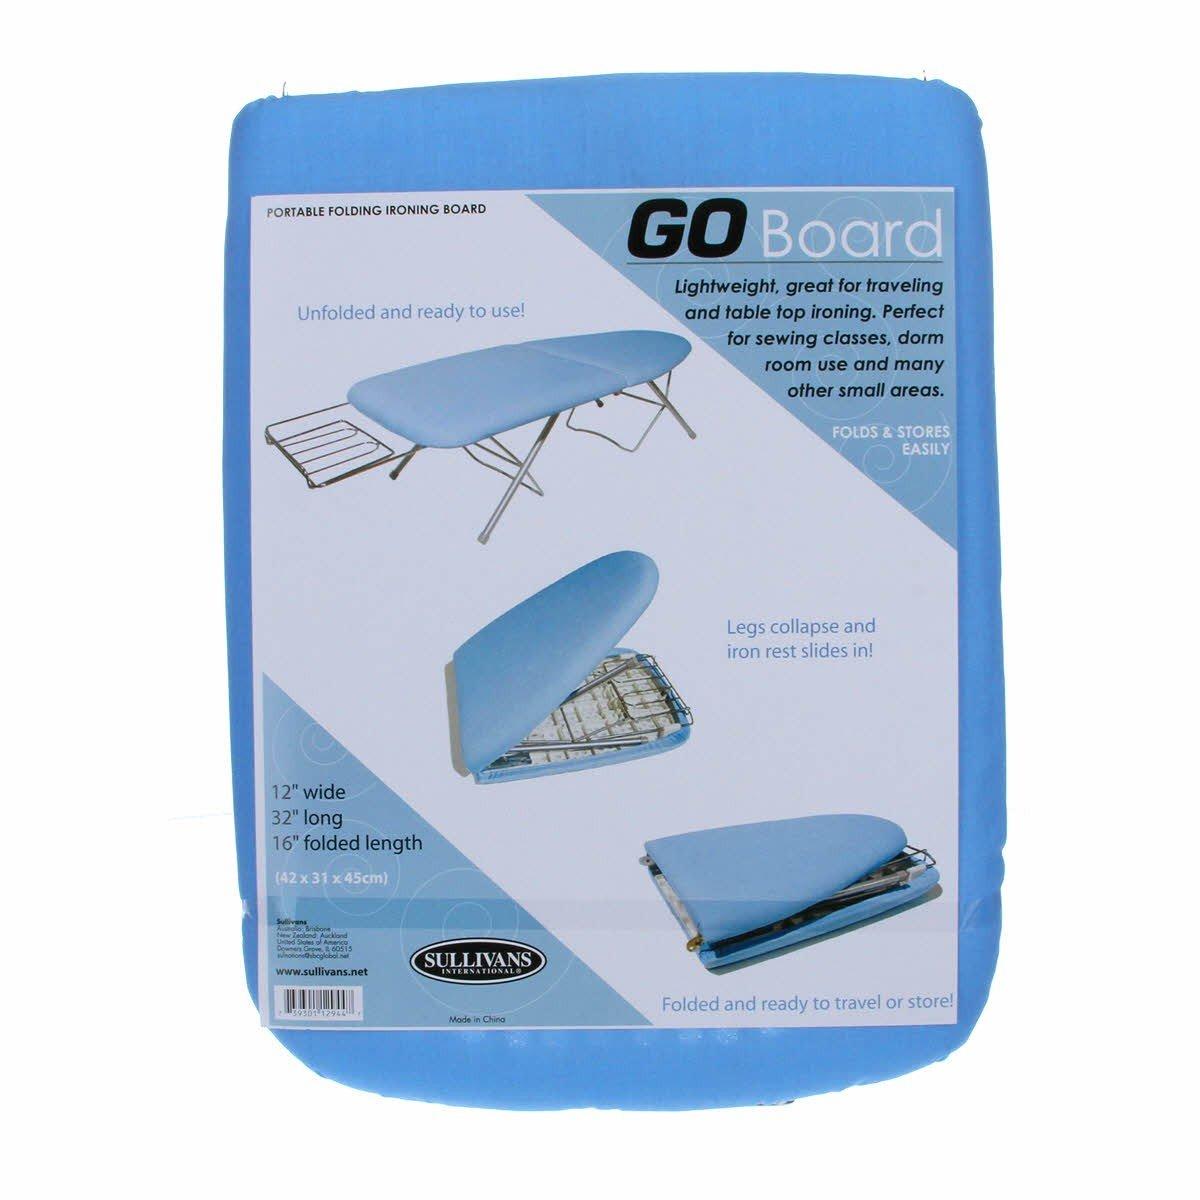 Sullivans Go Board Portable Ironing Board